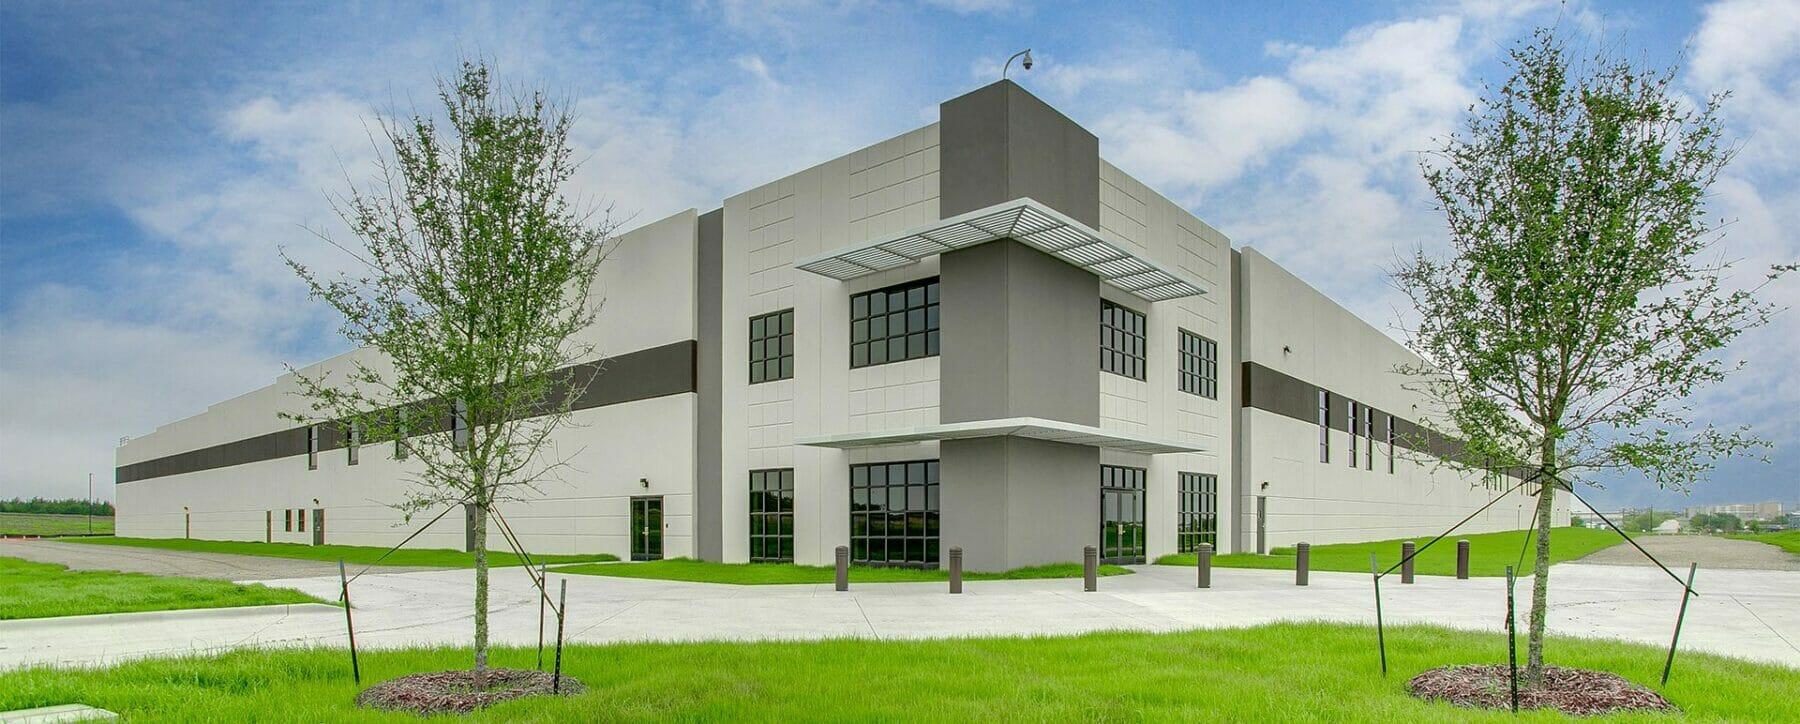 Klein Tools - Mansfield, TX 4